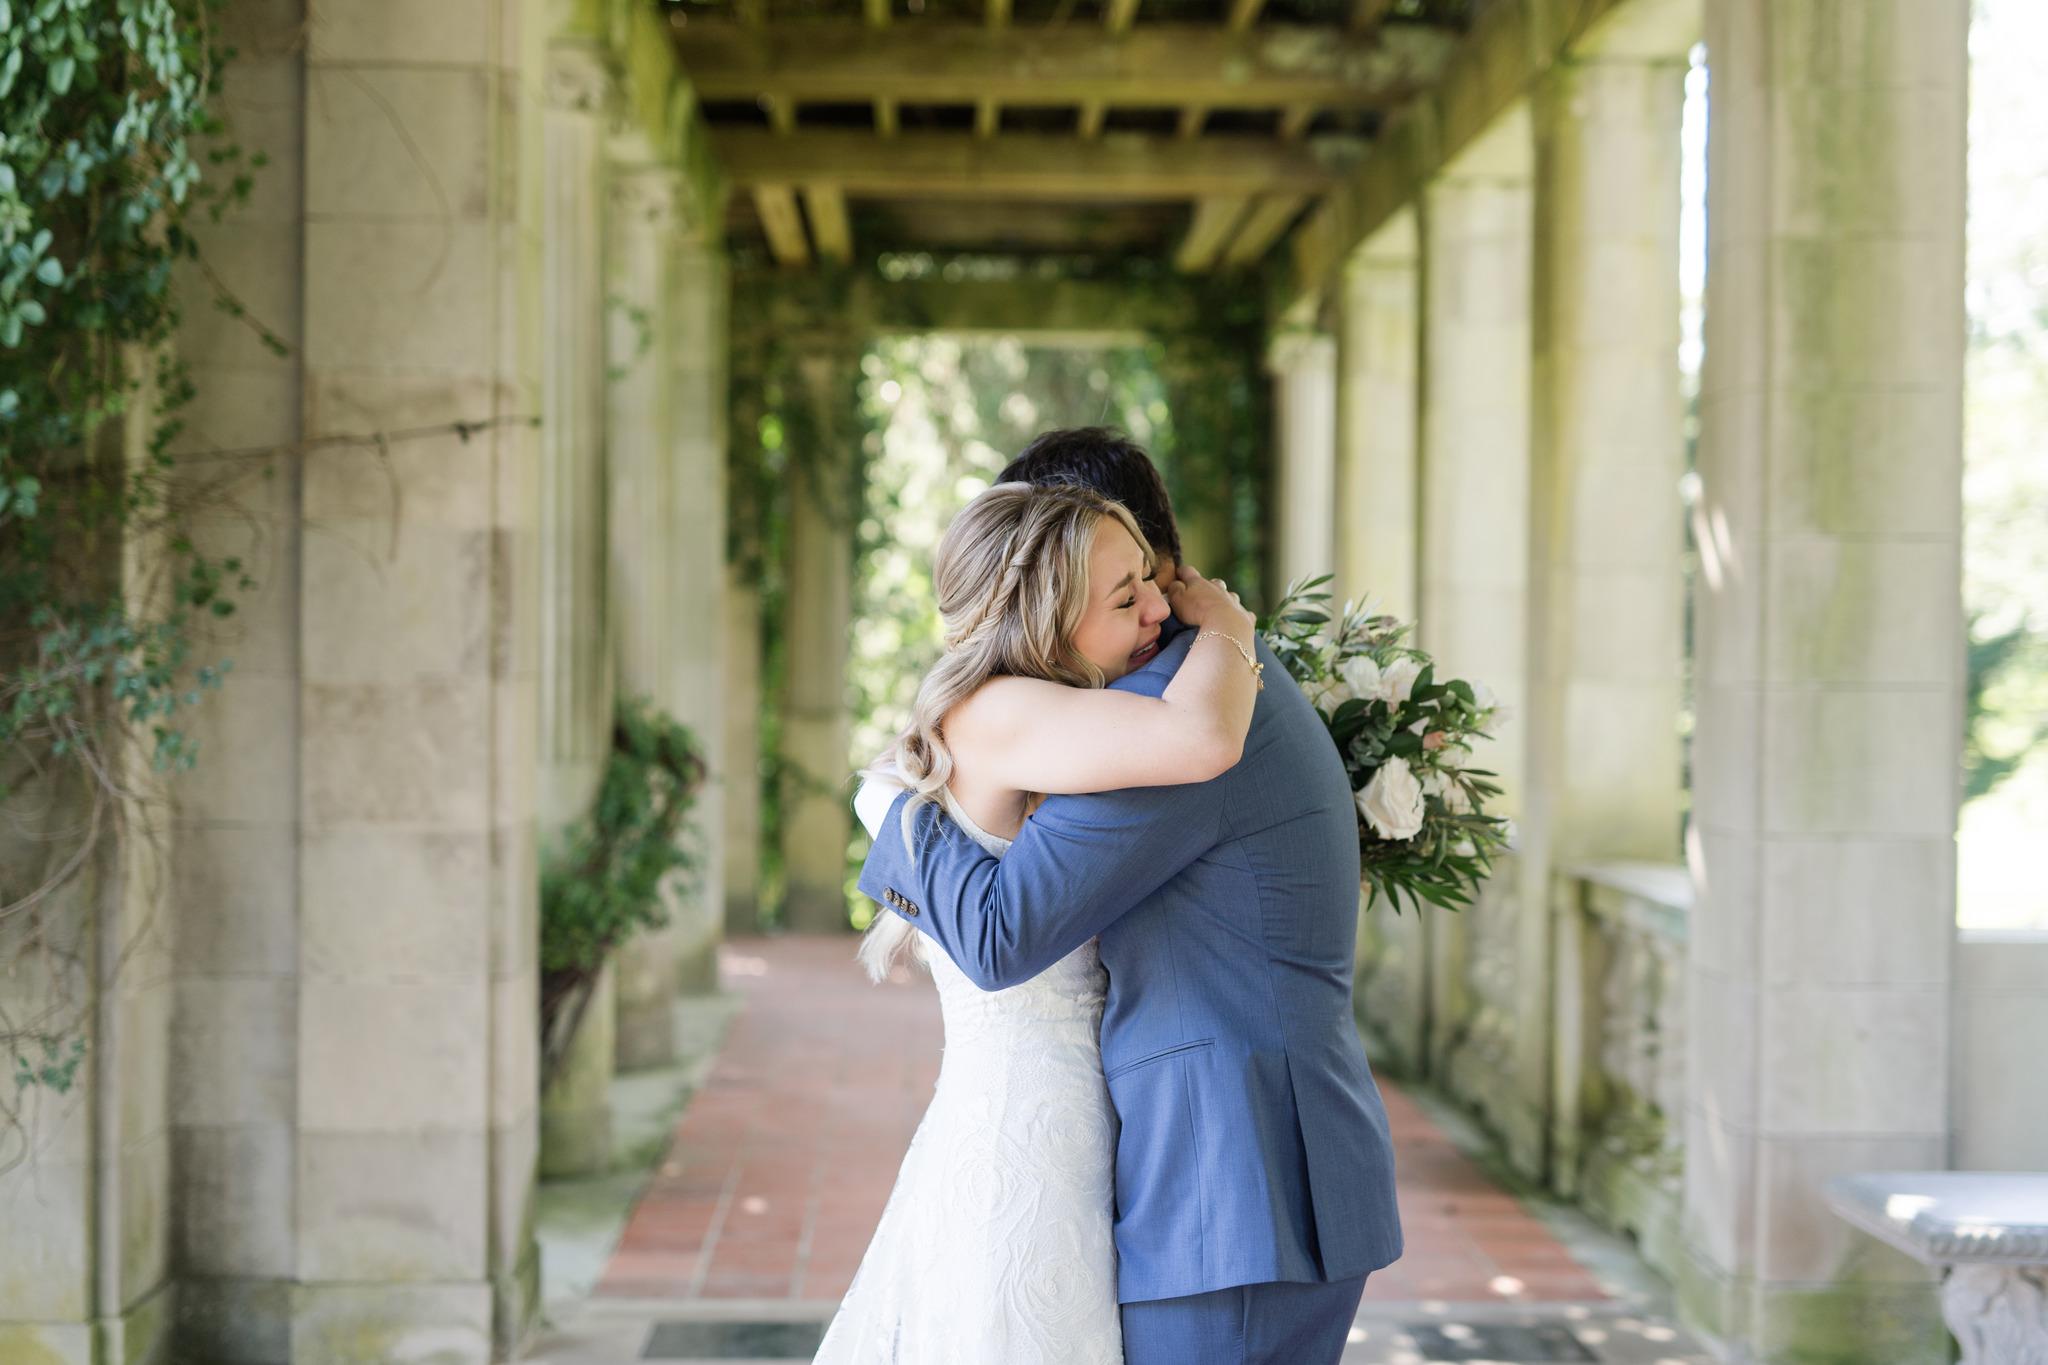 eolia mansion wedding_ct wedding photographer_ct wedding-10.jpg